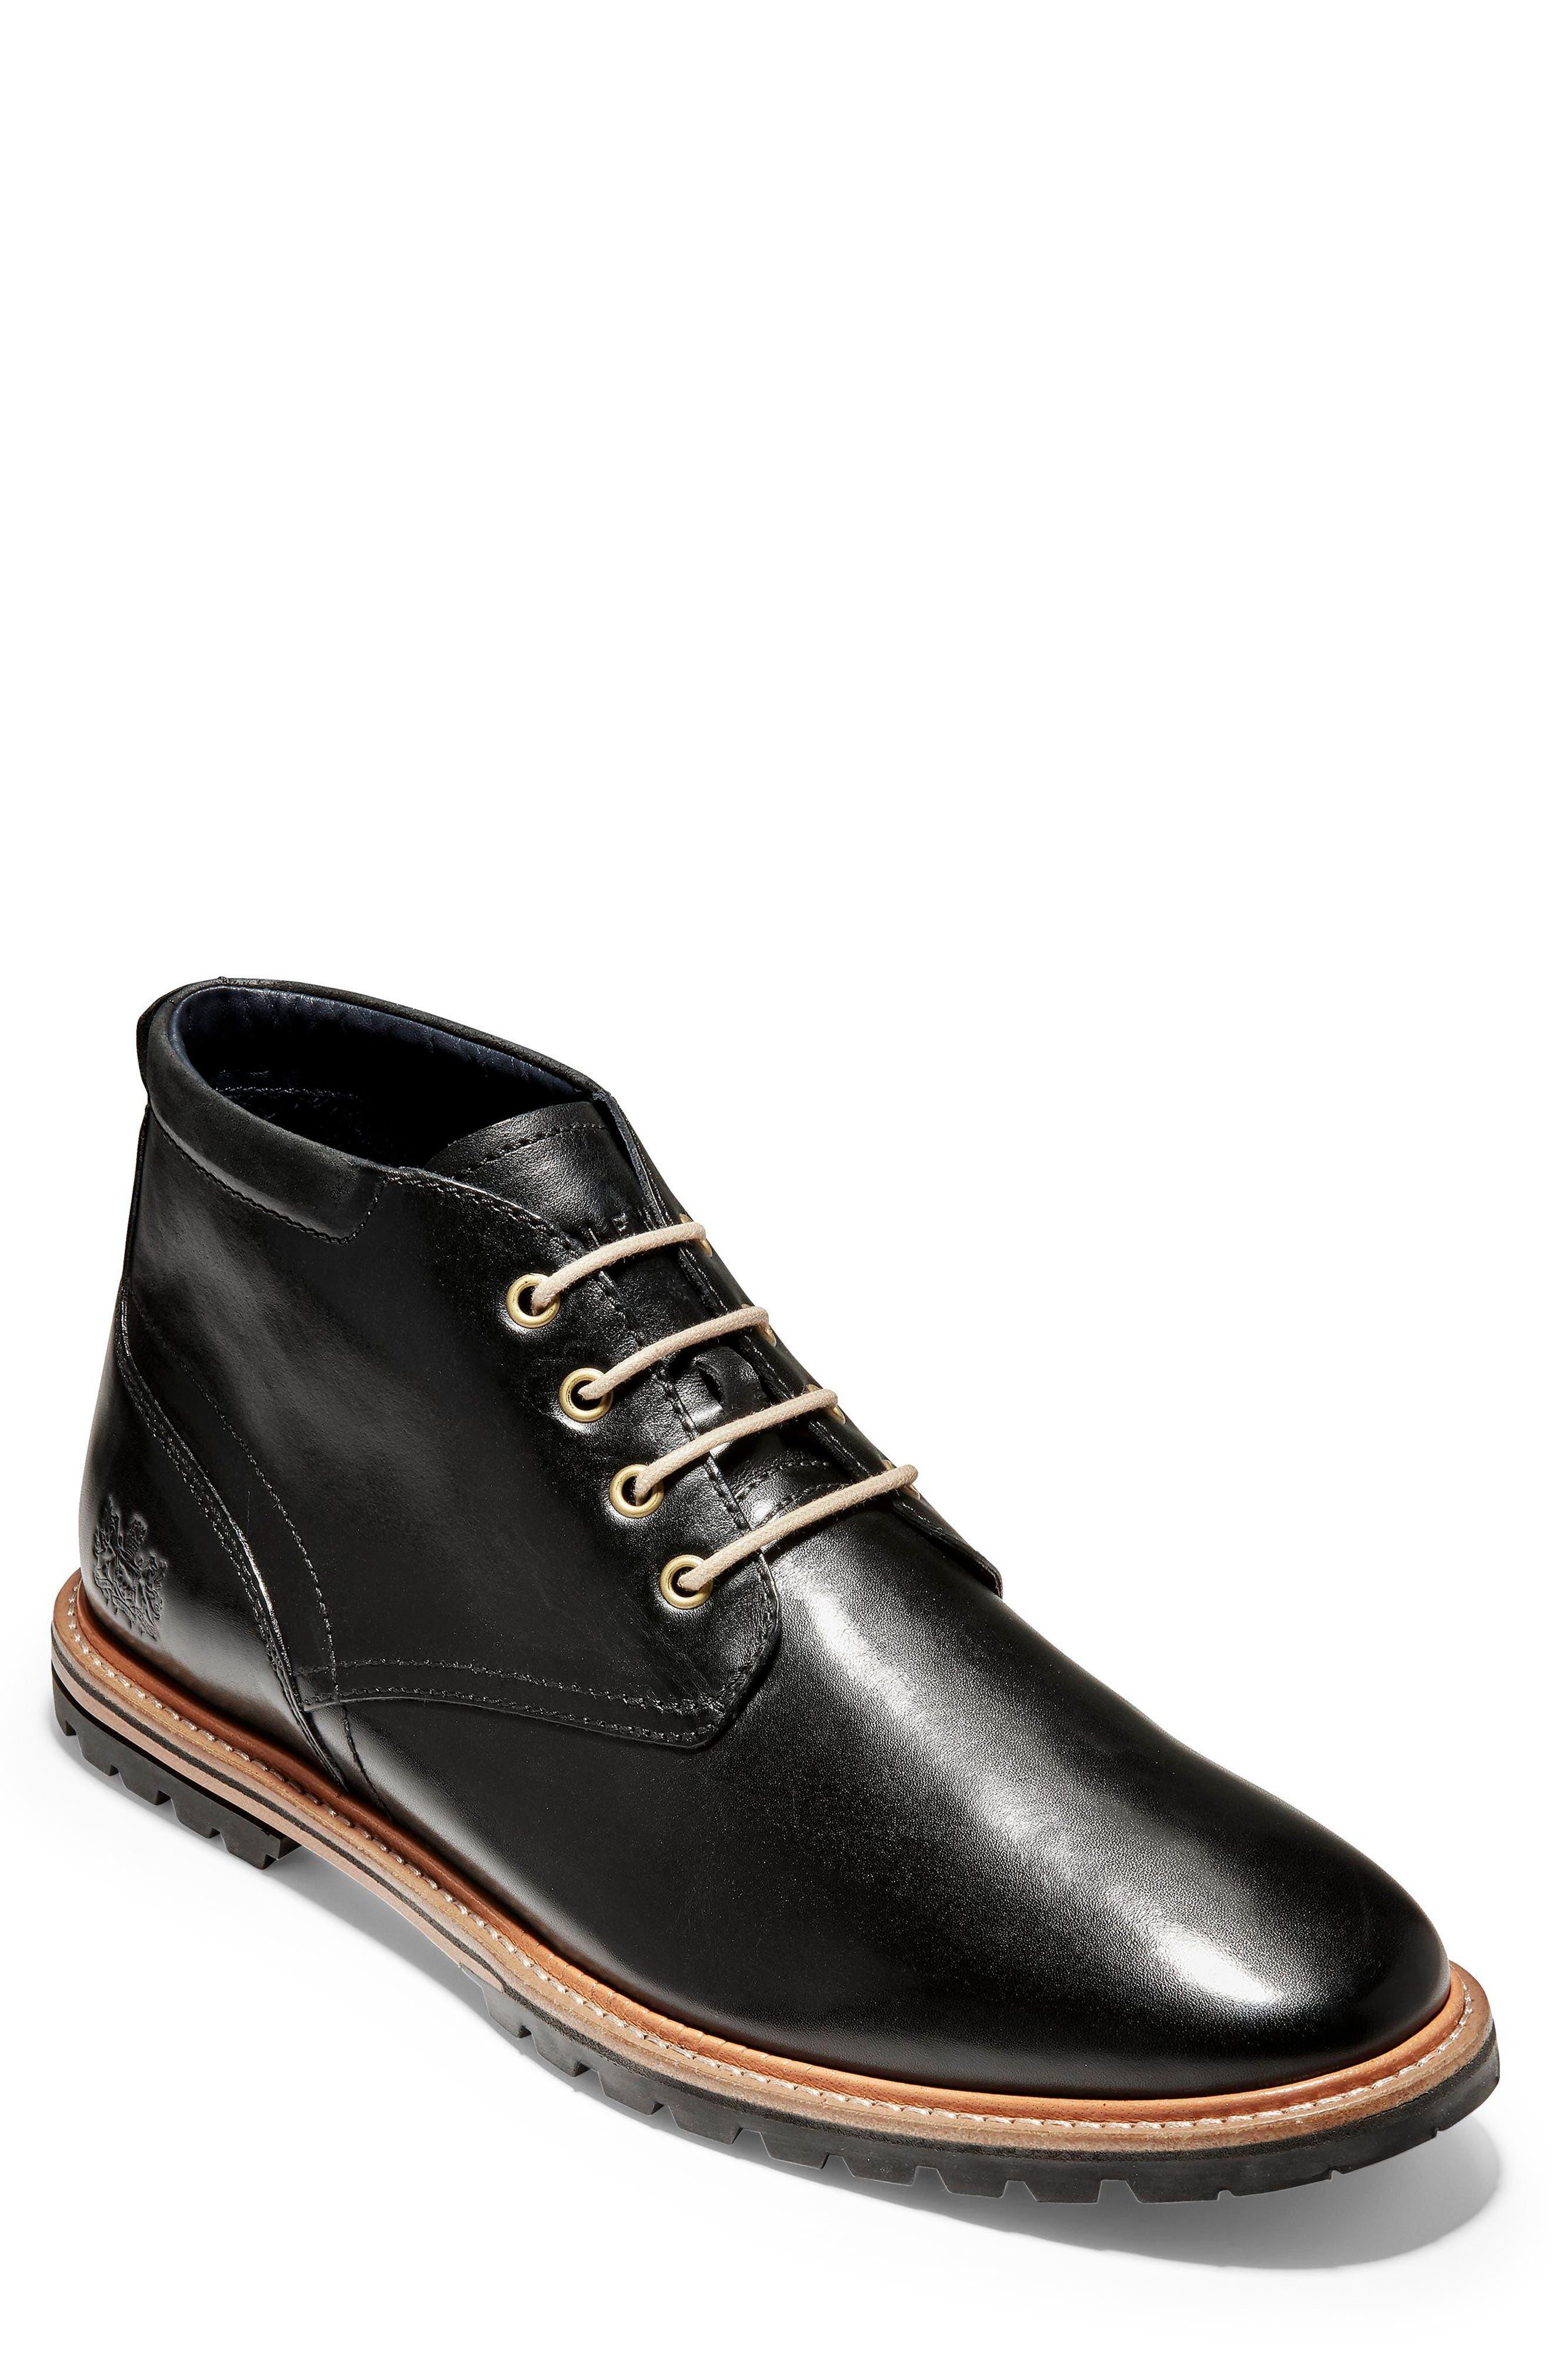 Cole Haan Raymond Grand Chukka Boot- Black